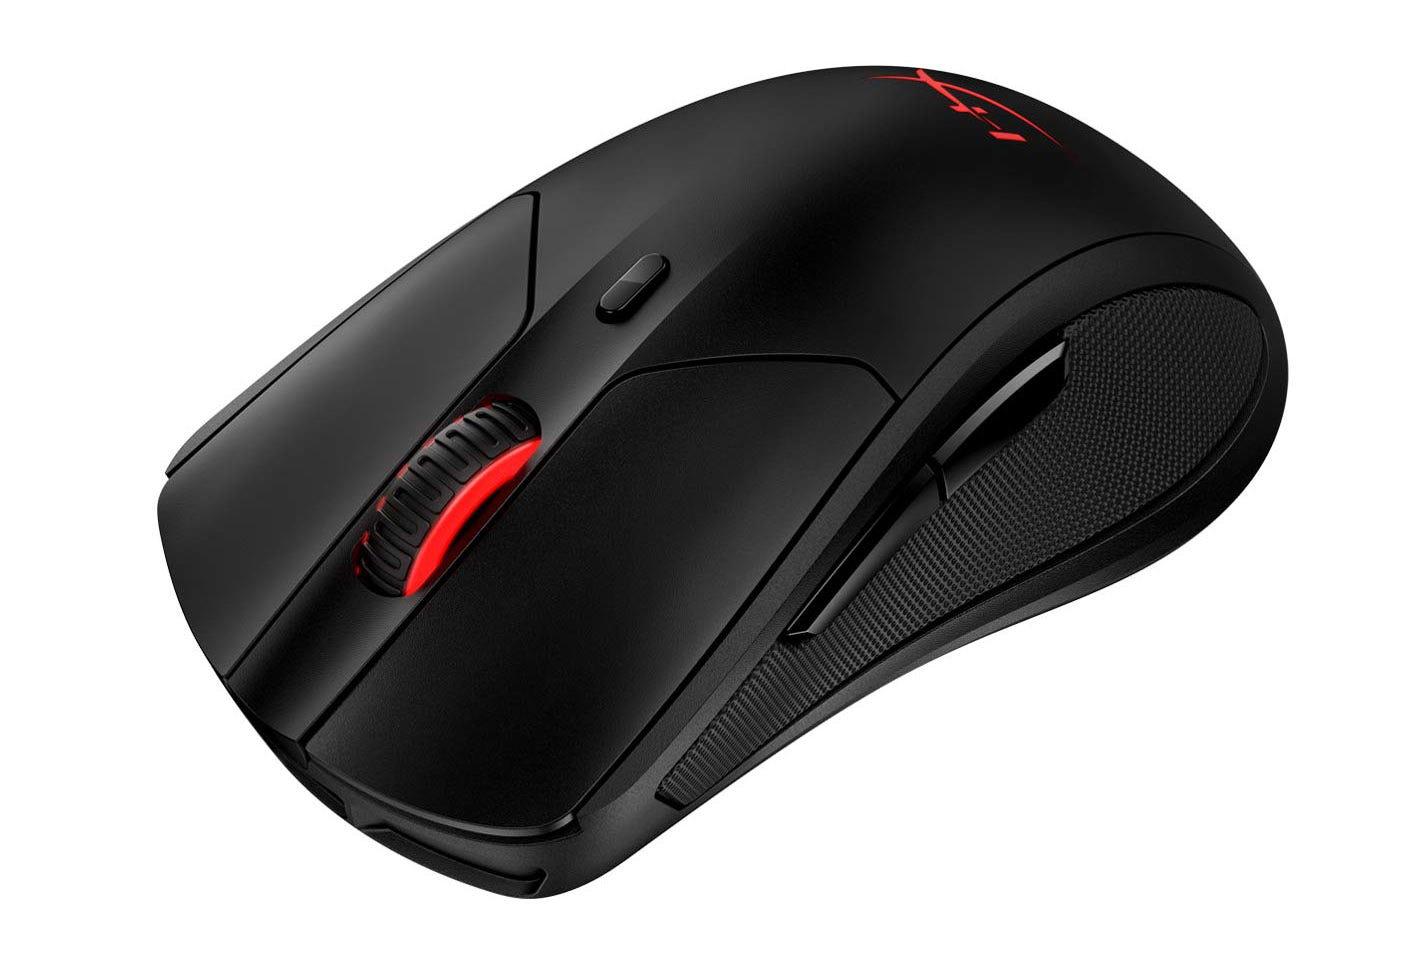 The HyperX Pulsefire Dart mouse.